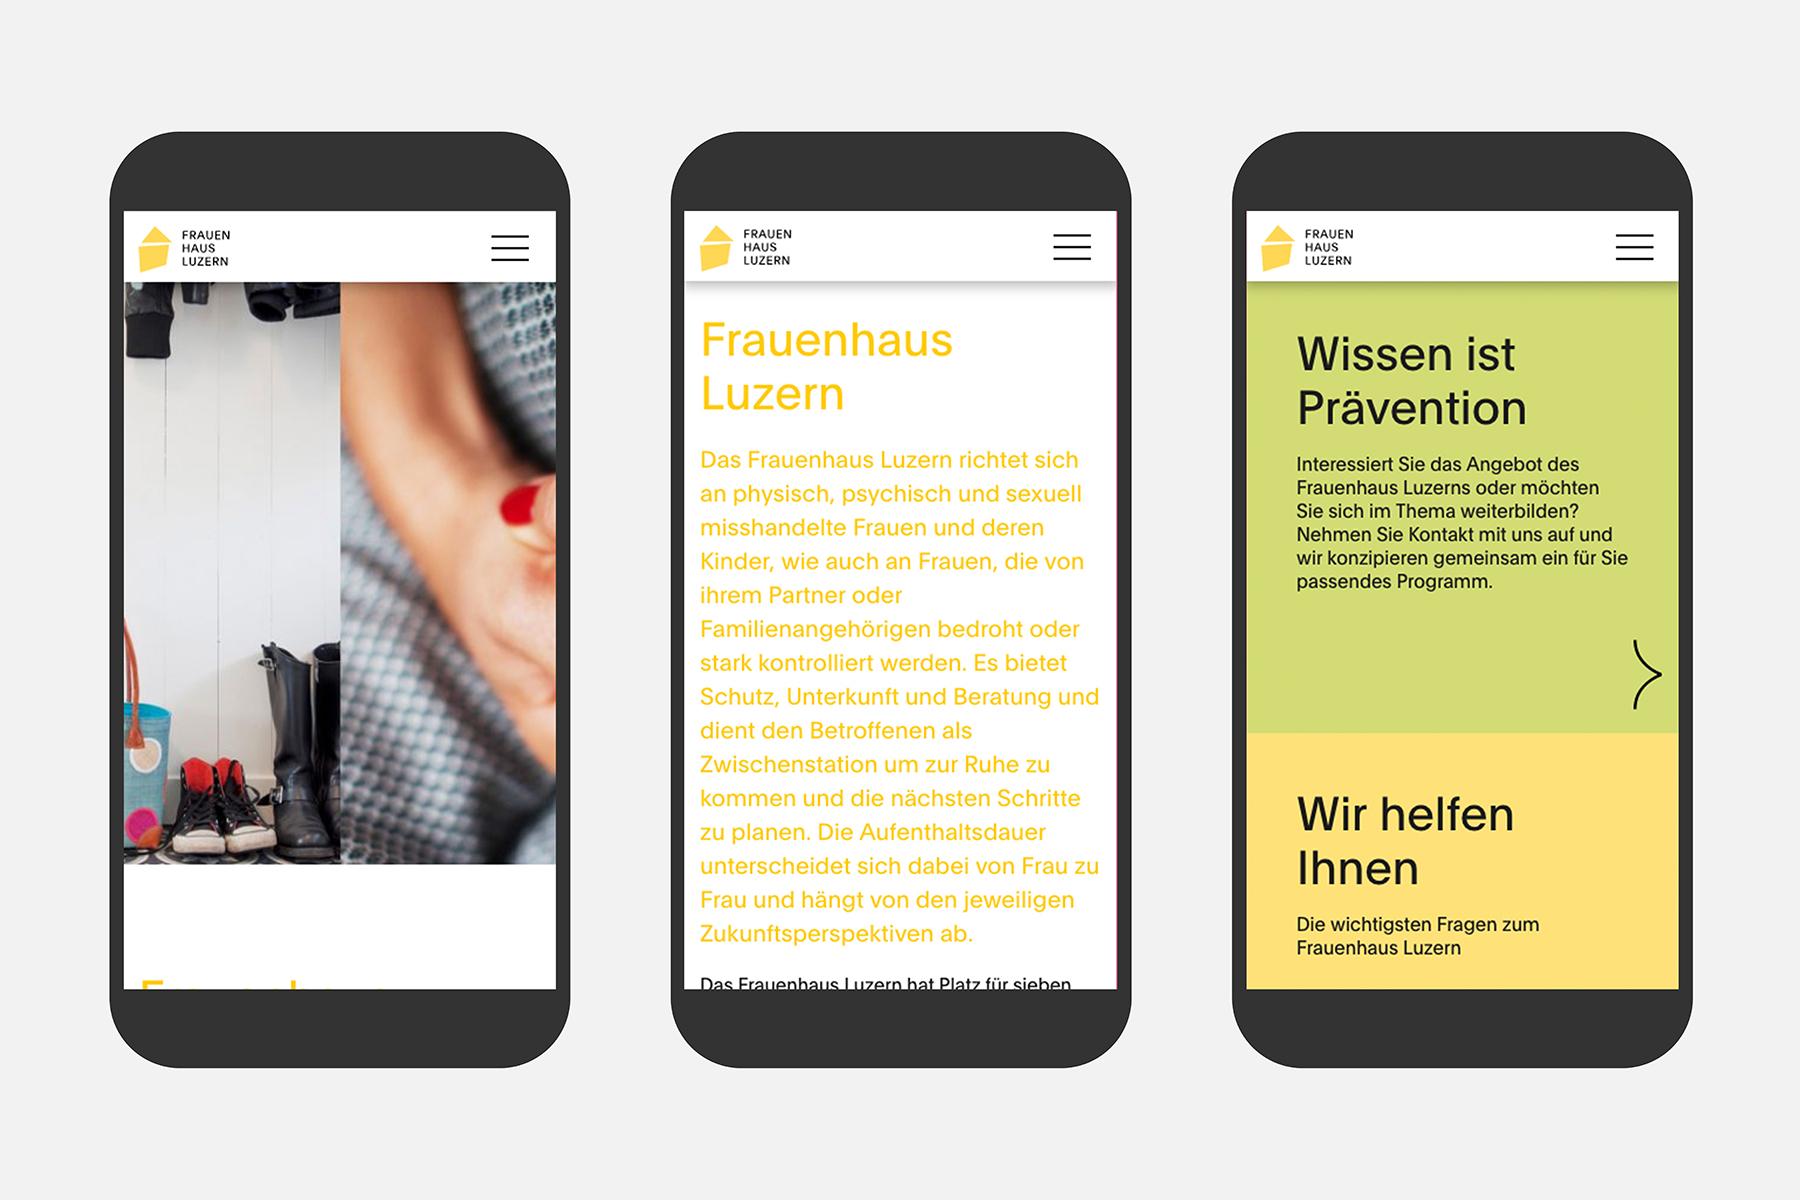 Frauenhaus Luzern Web Usability Smartphone UX